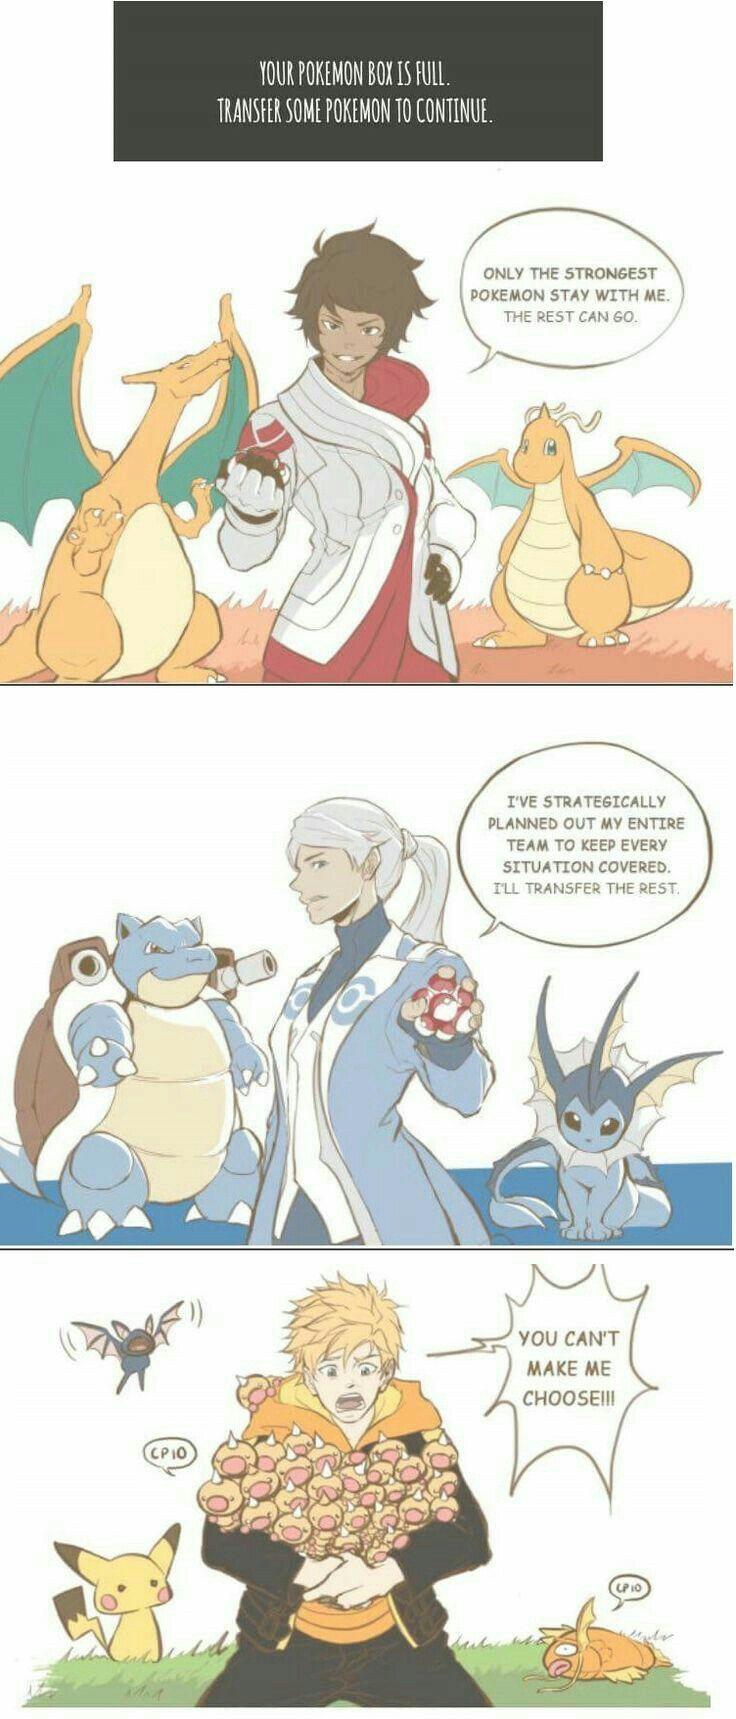 Your Pokémon box is full, transfer some Pokémon to continue, funny, text, Team Mystic, Team Instinct, Team Valor, Trainers, comic, Pokémon, cute, Pokémon Go; Pokémon